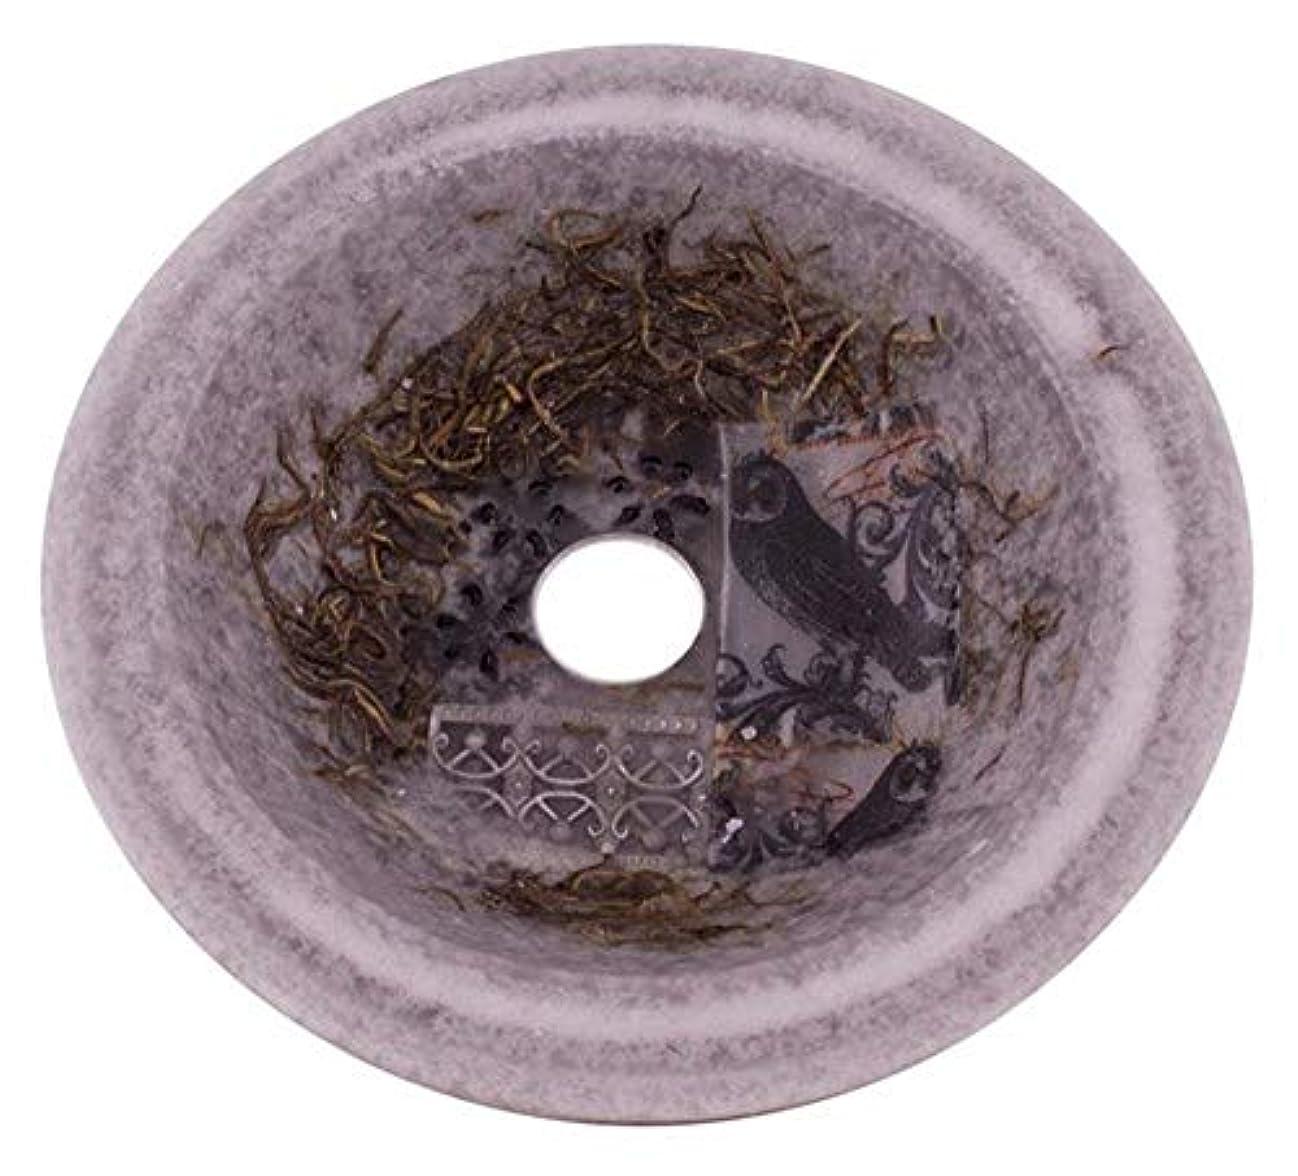 HabershamキャンドルMoonlight At Midnightワックス陶器Home Fragrance 5.5